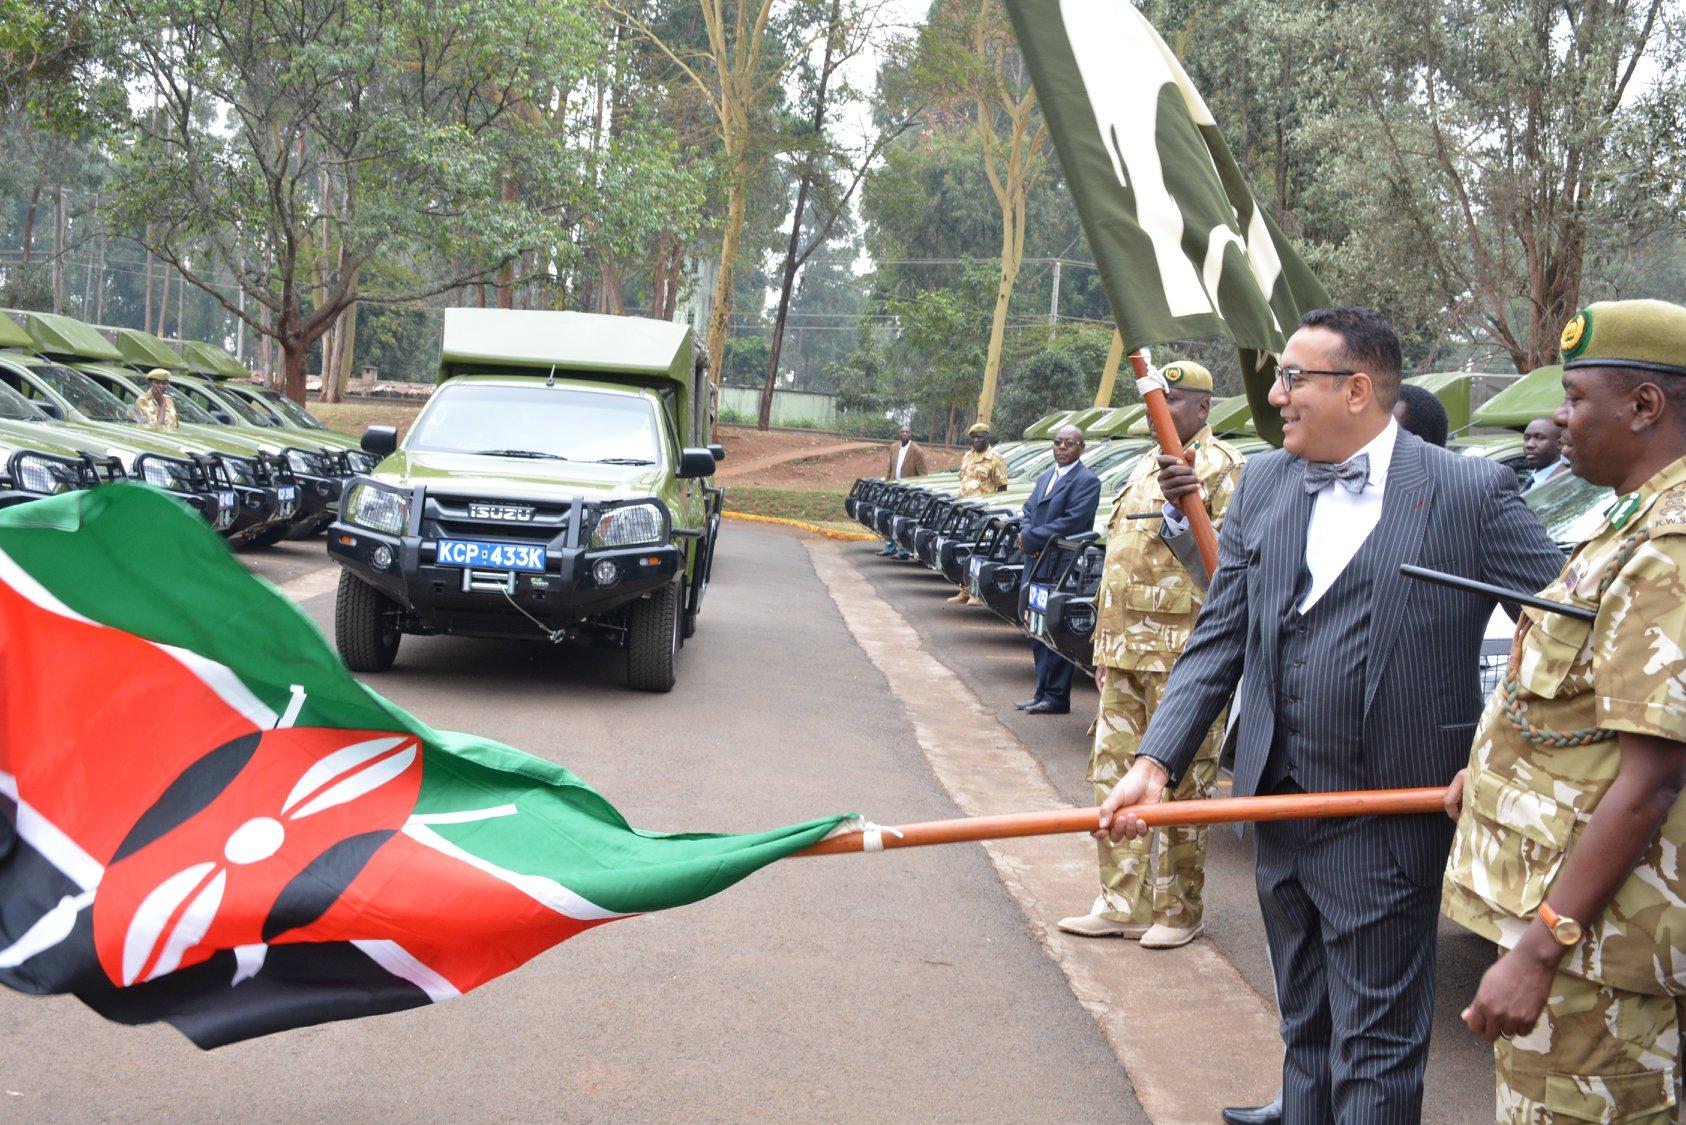 Kenya: CS Najib Balala Hands over 26 vehicles to KWS